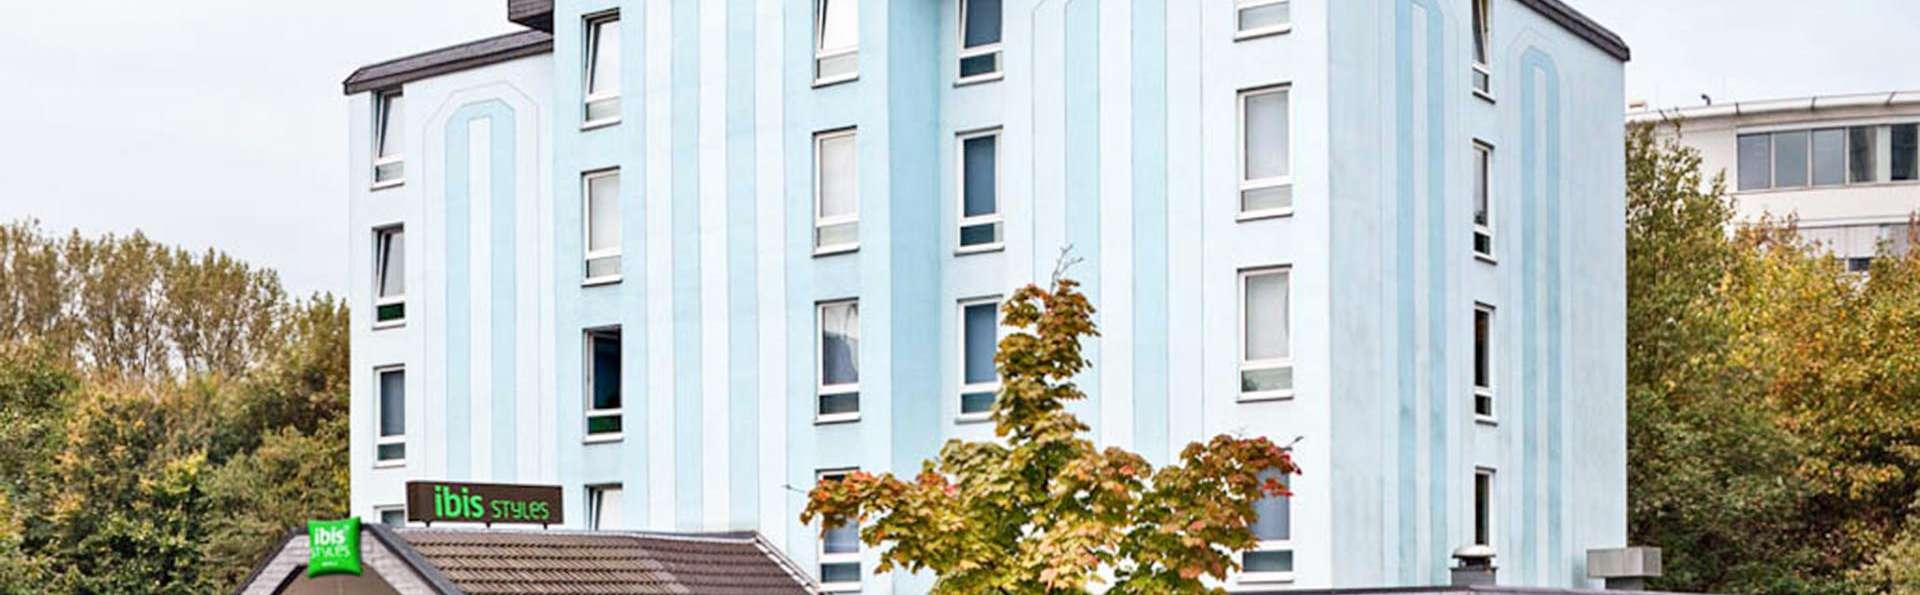 Ibis Styles Duesseldorf-Neuss - EDIT_EXTERIOR_01.jpg